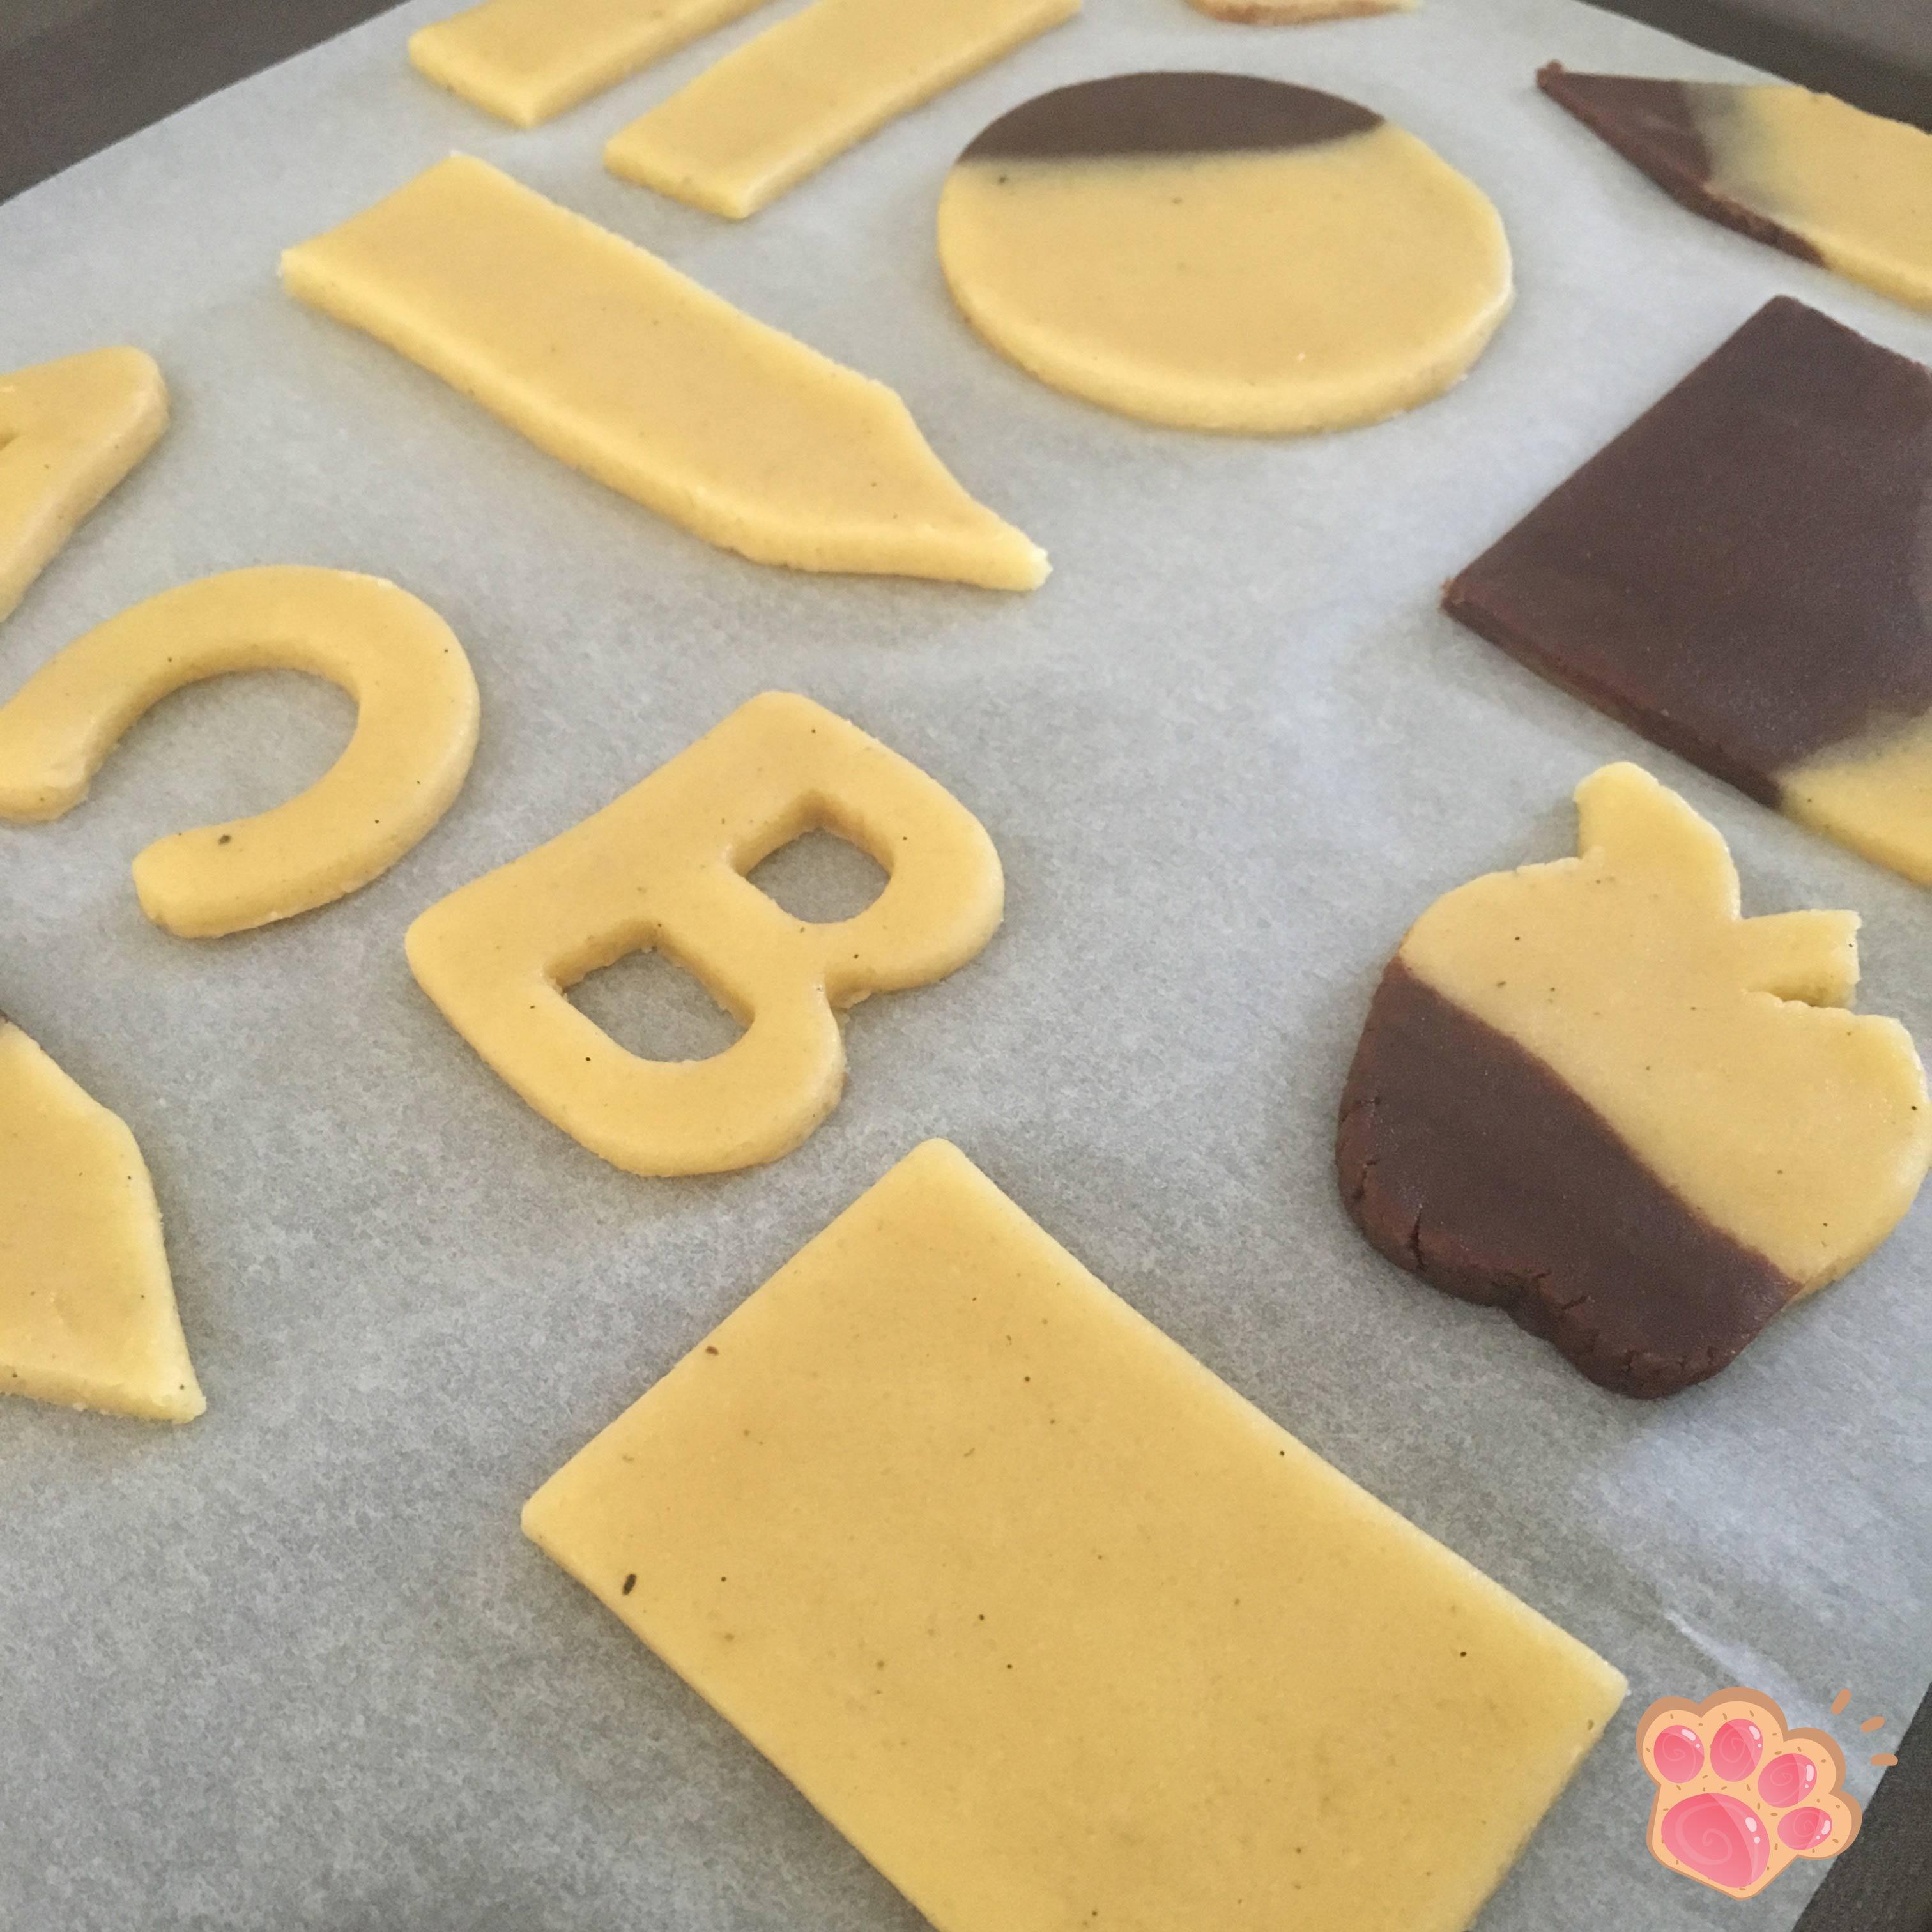 biscuits de rentrée des classes